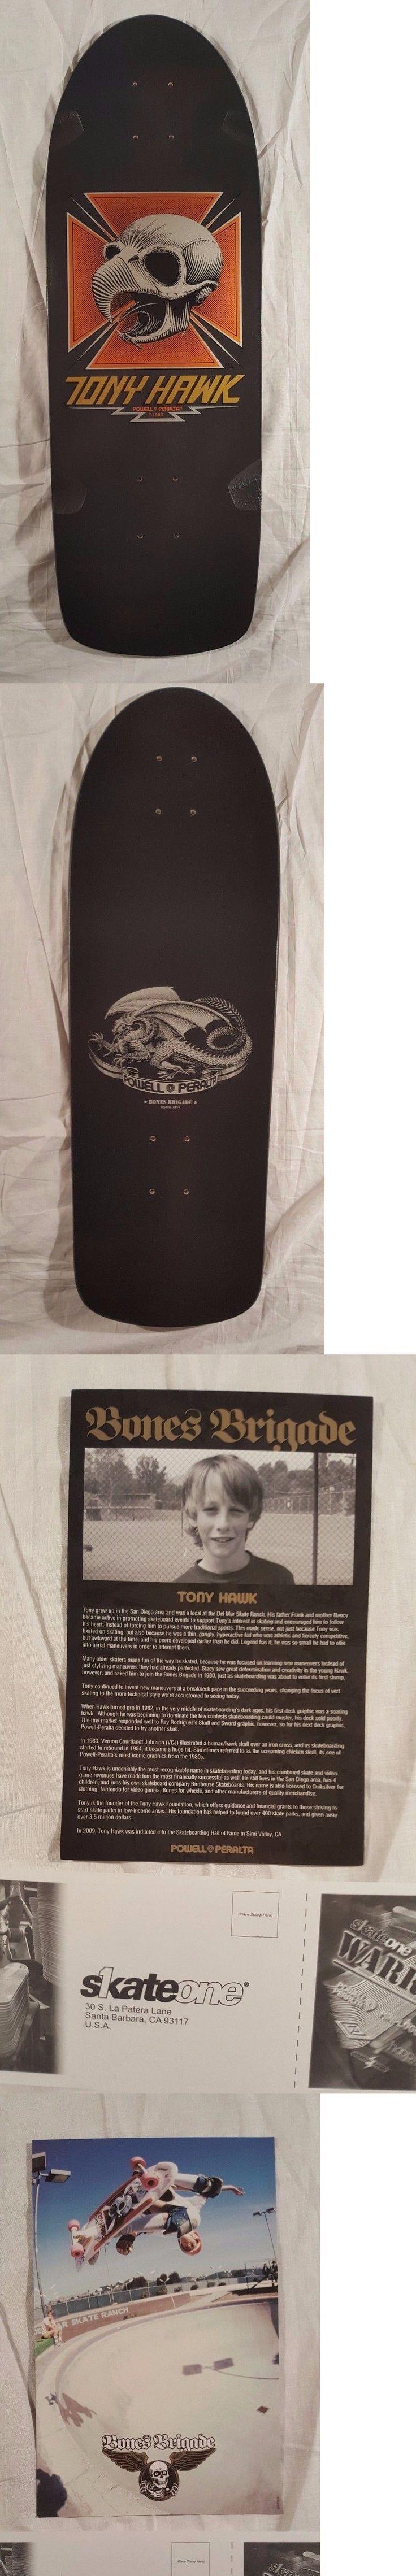 Decks 16263: Rare Black Powell Peralta Tony Hawk Chicken Skull 1 Reissue Skateboard Deck -> BUY IT NOW ONLY: $150 on eBay!